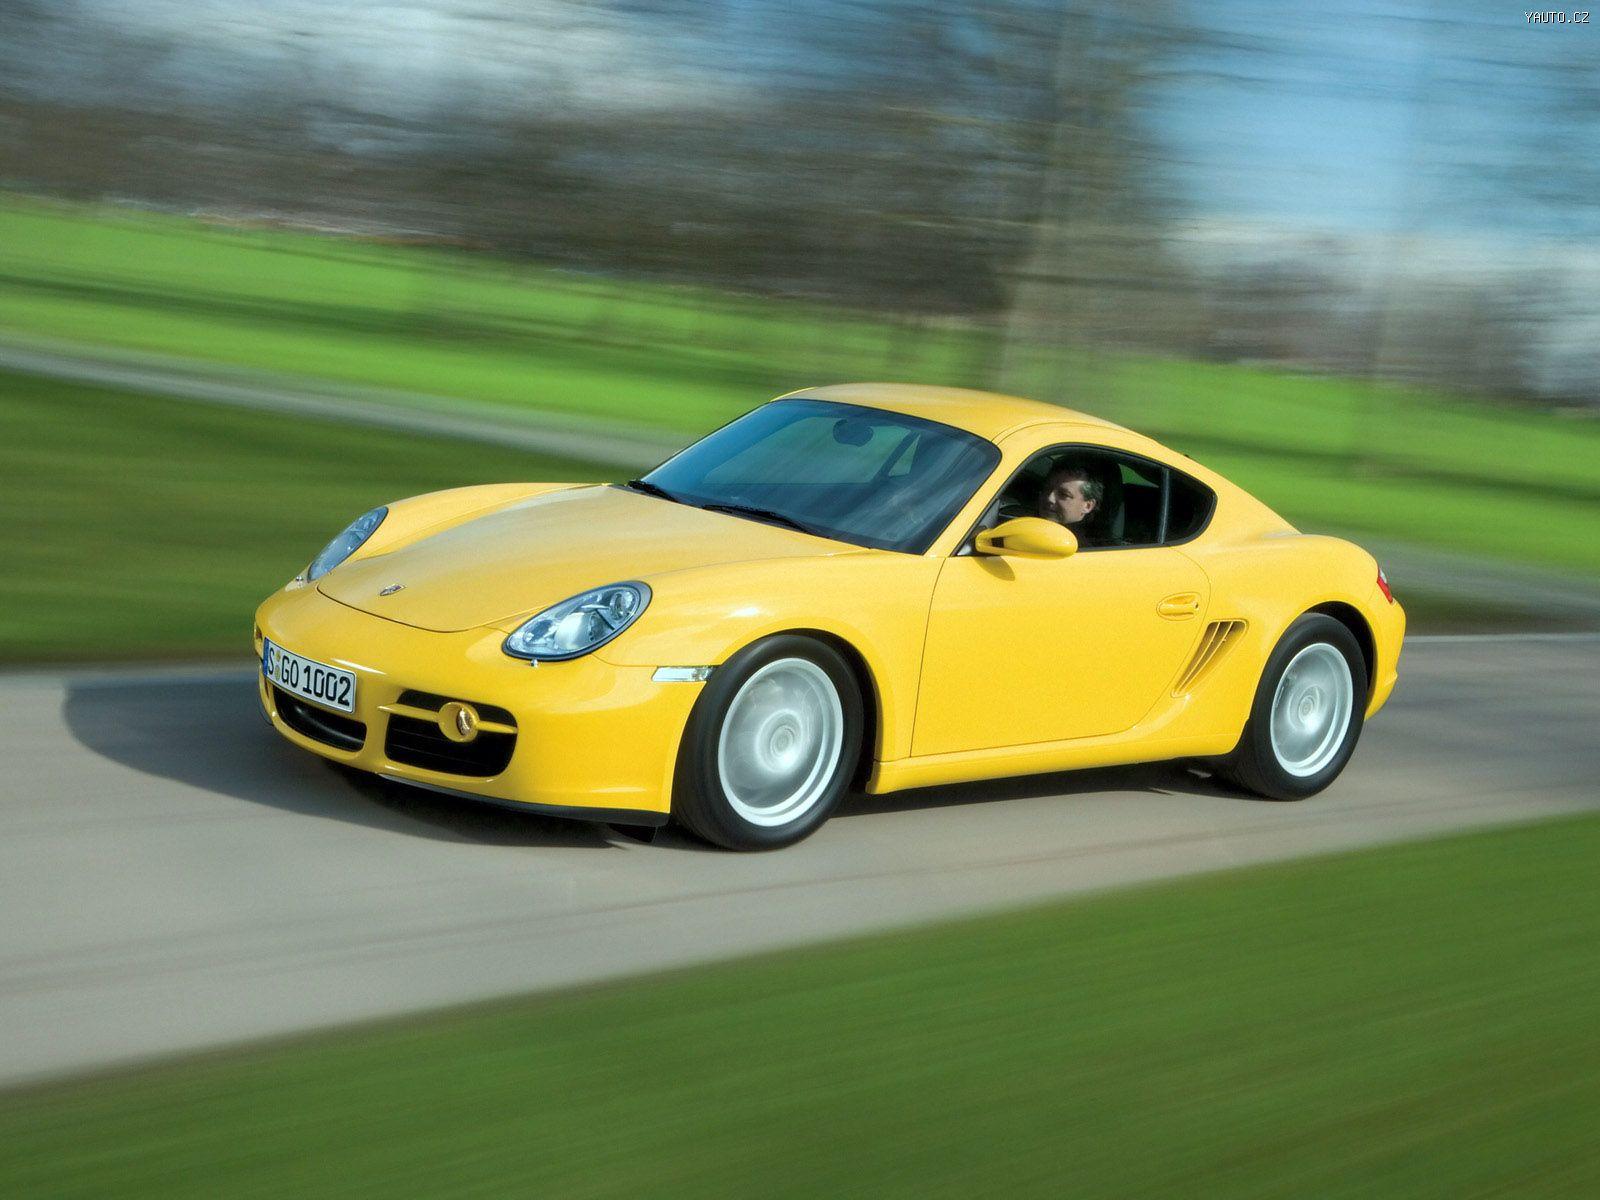 http://img.yauto.cz/tapety/Porsche_Cayman_2006_2.jpg